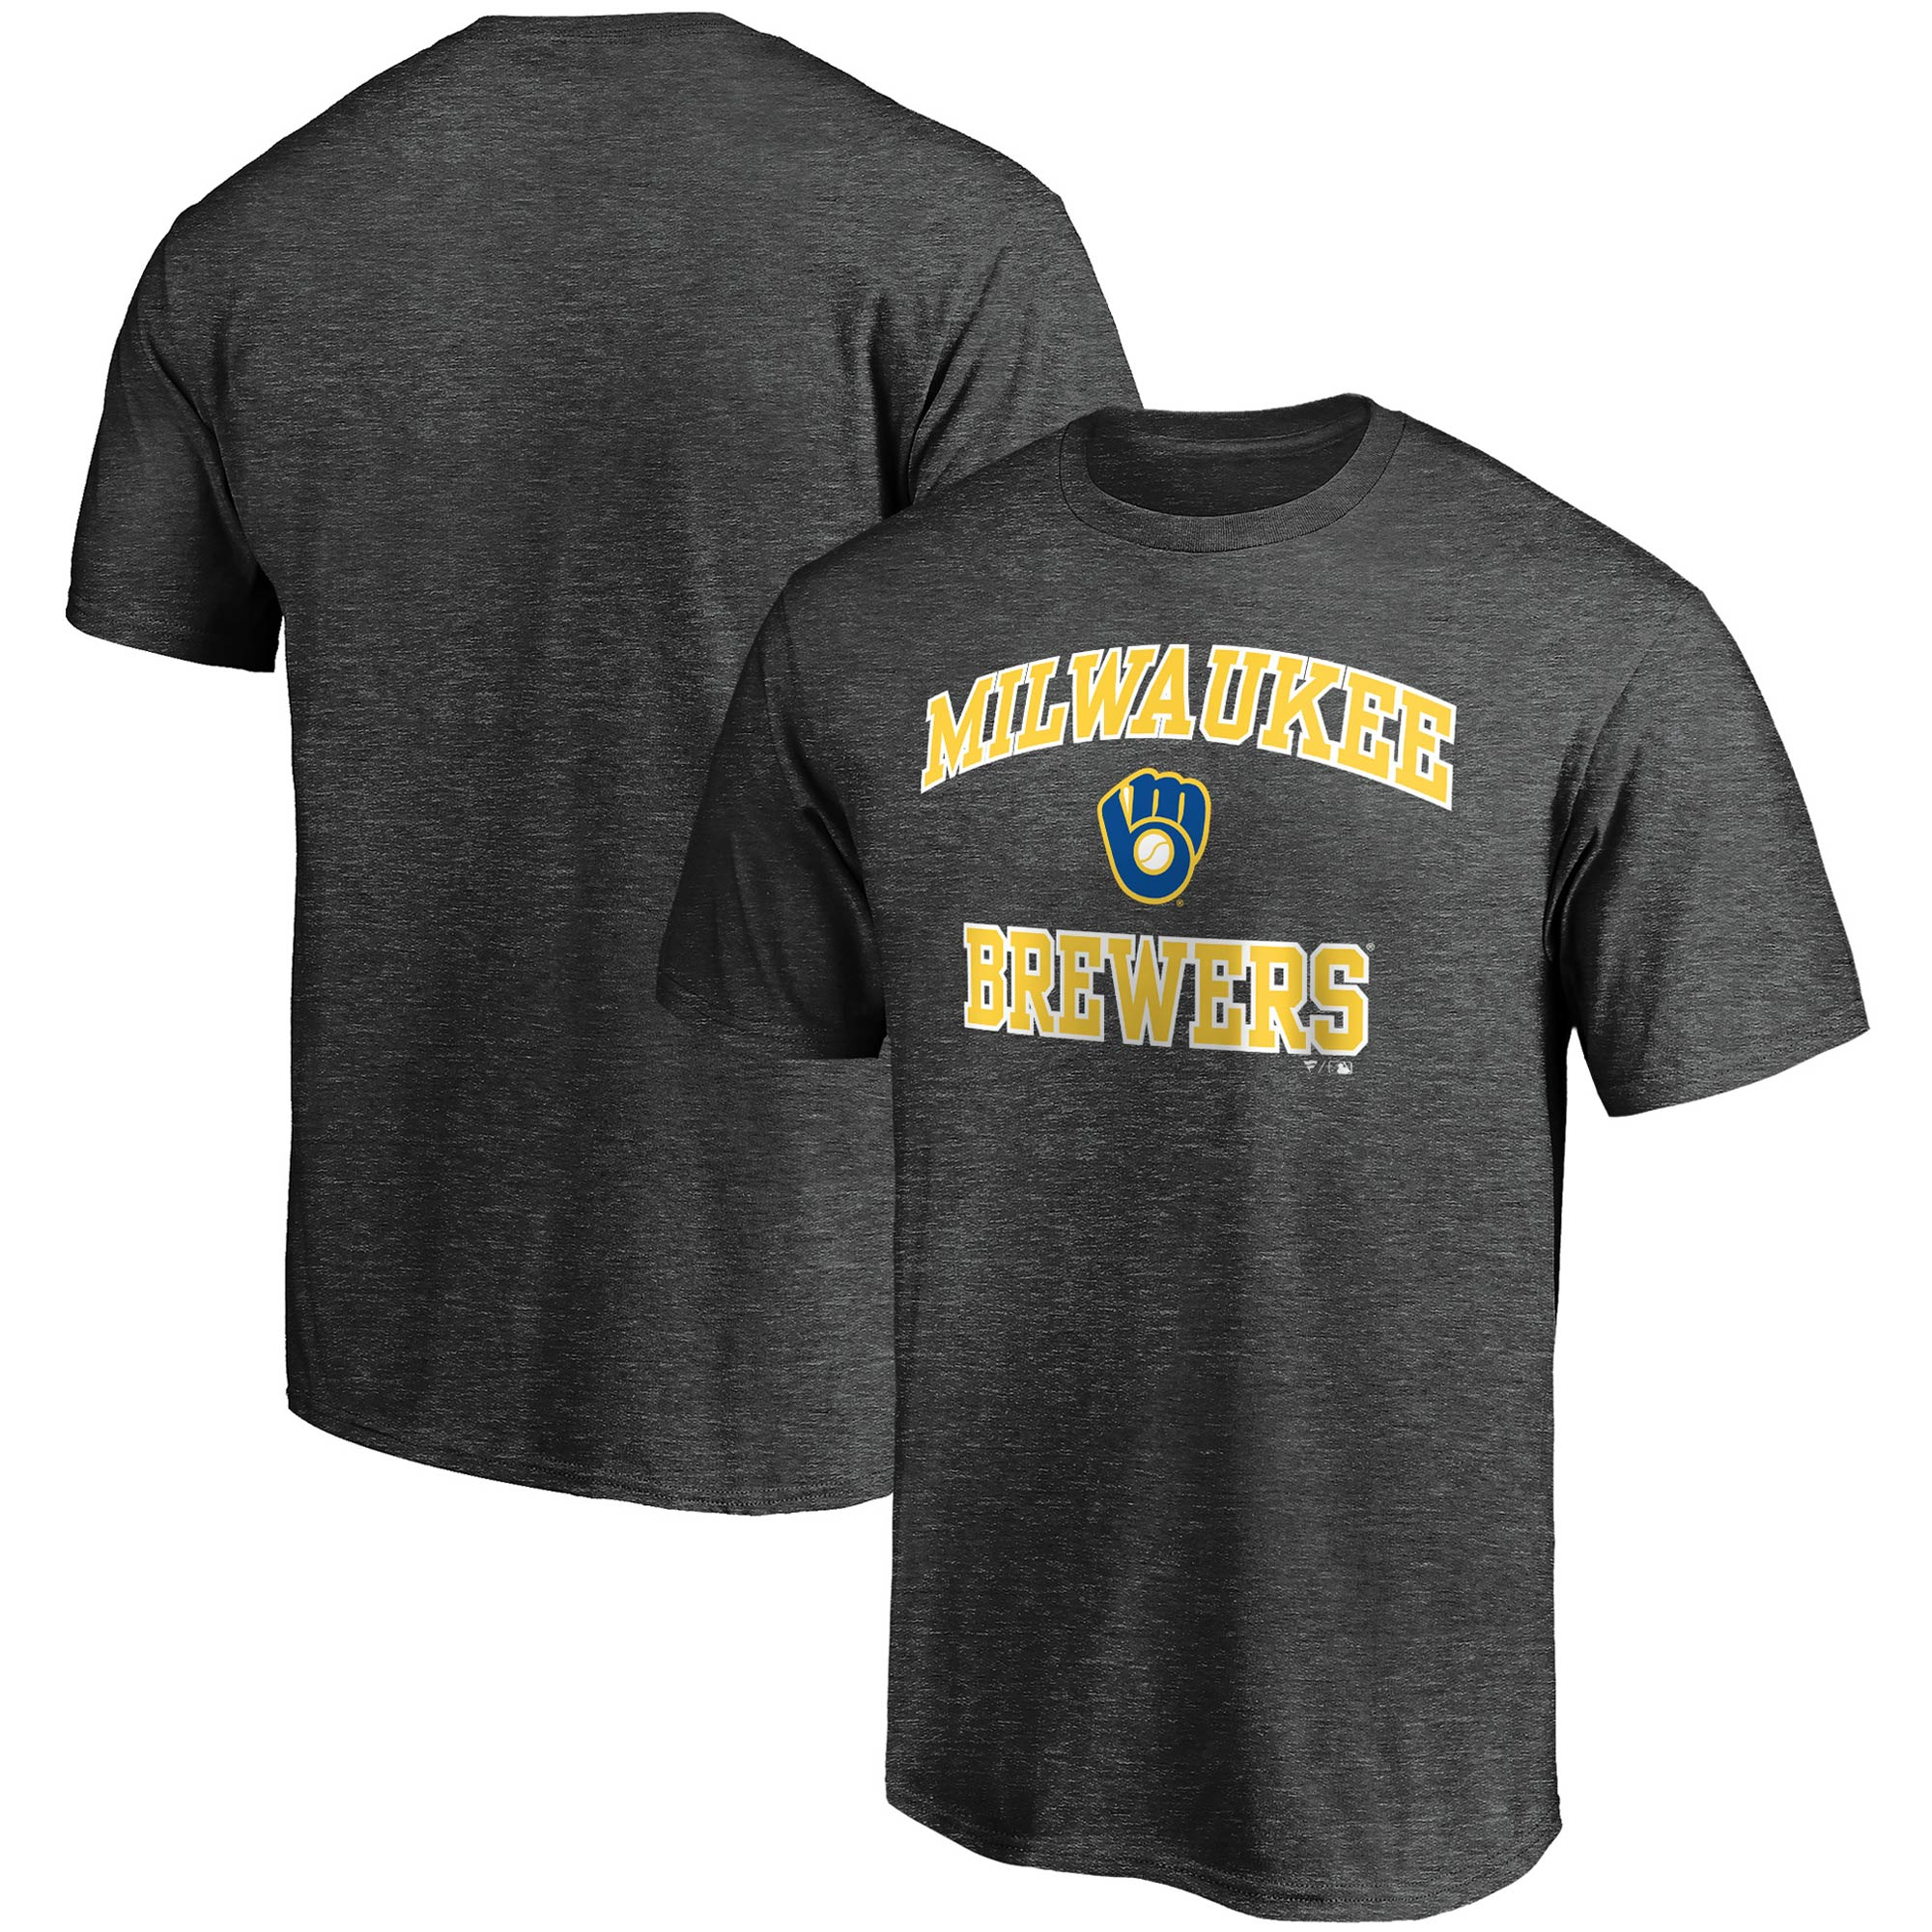 Milwaukee Brewers Fanatics Branded Heart & Soul T-Shirt - Charcoal